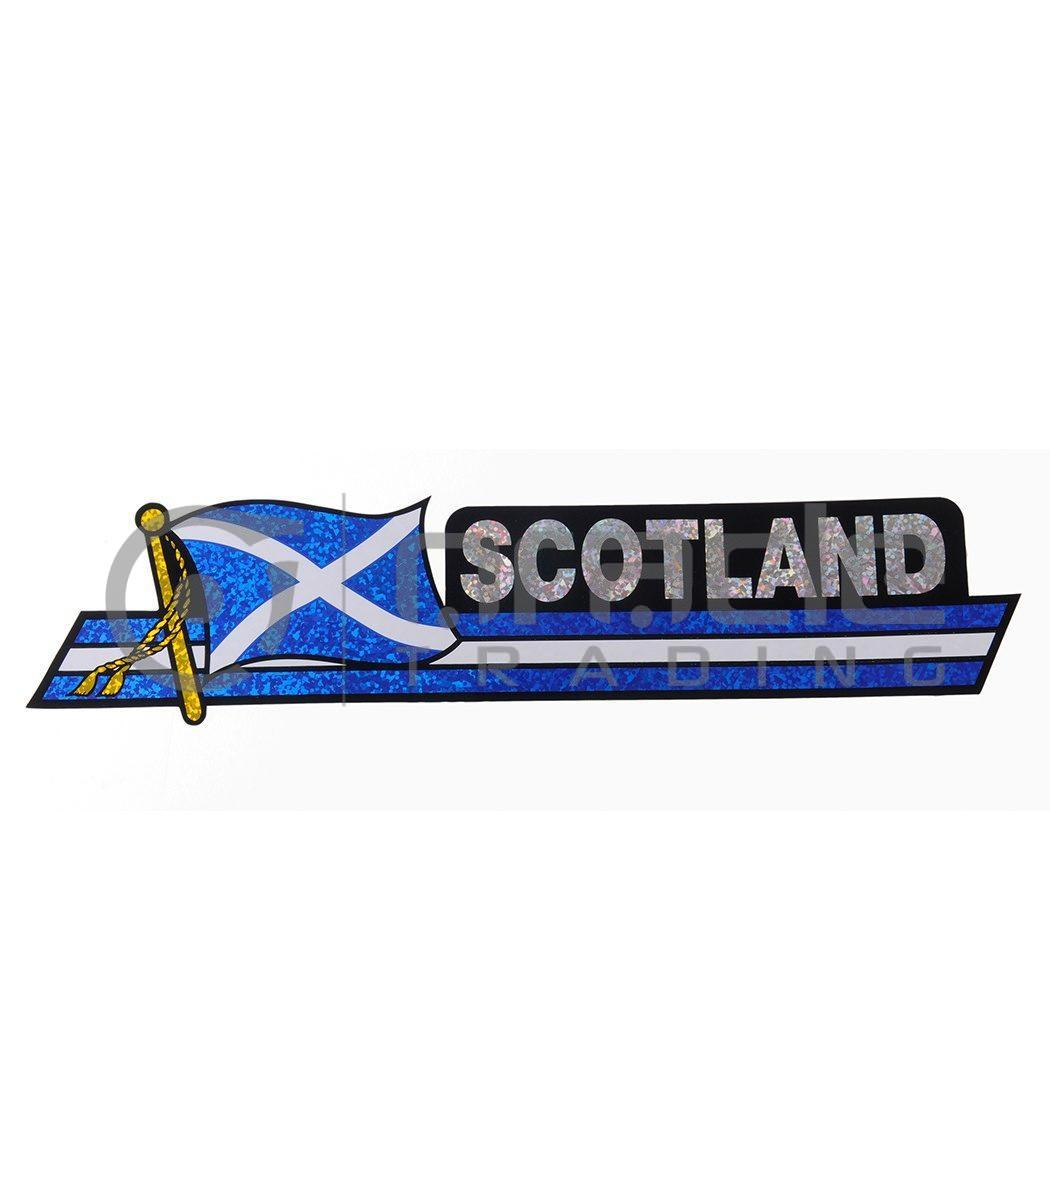 Scotland Long Bumper Sticker (St. Andrew's Cross)